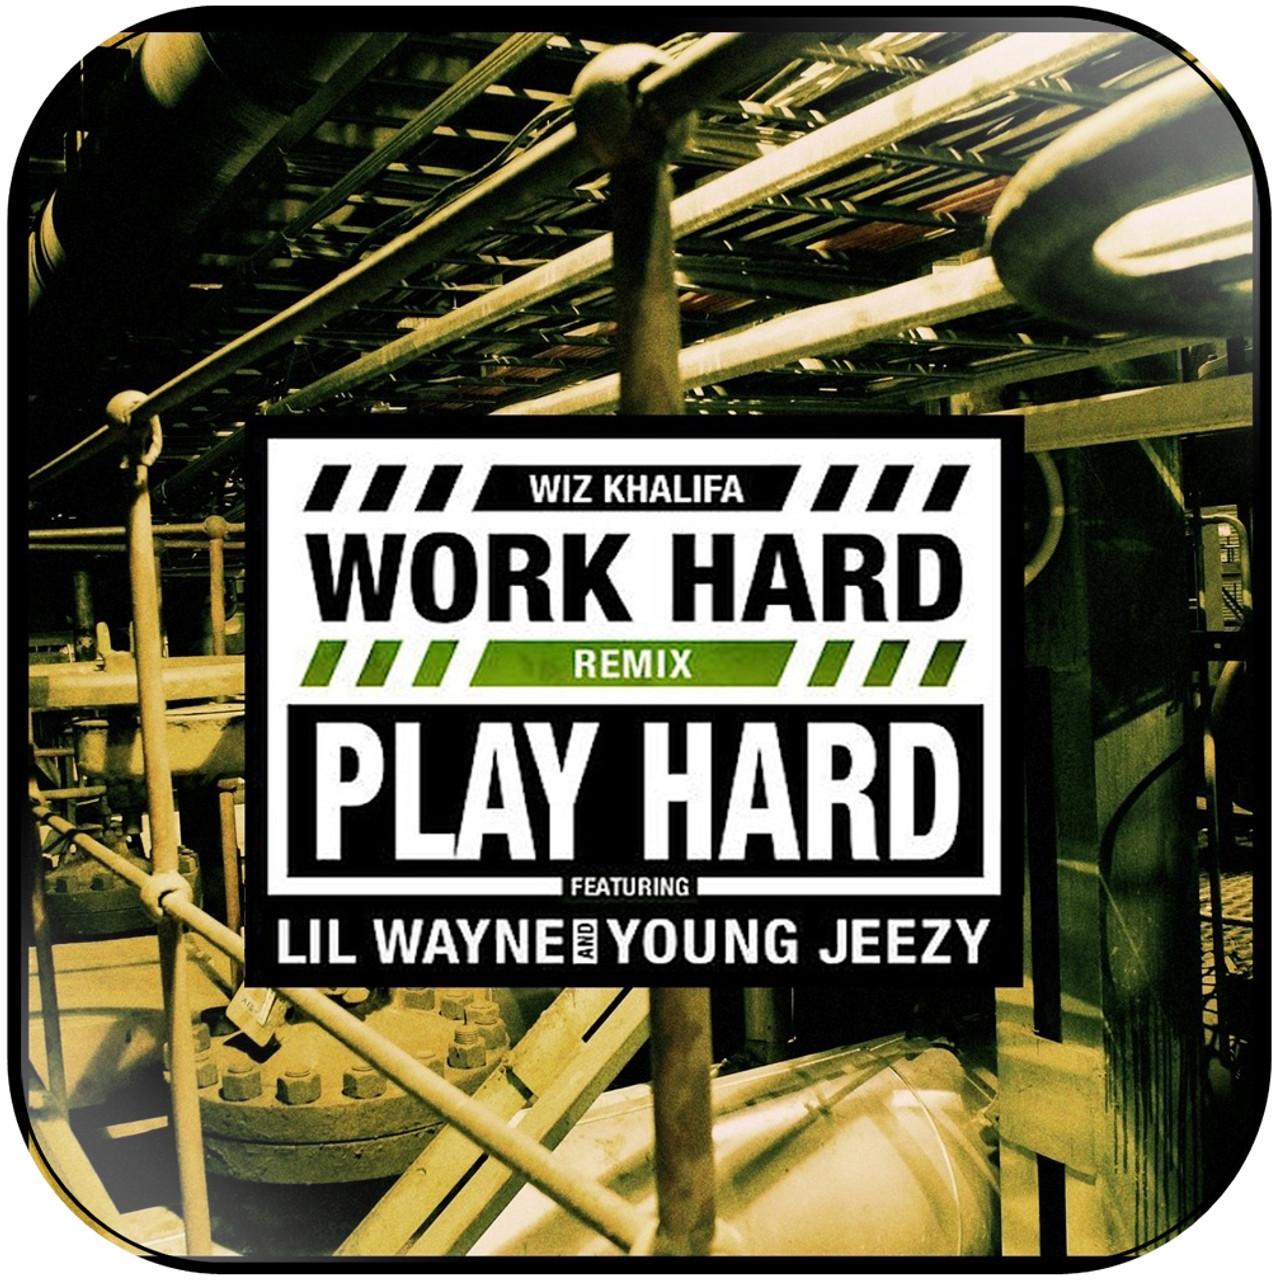 wiz khalifa work hard play hard remix album cover sticker